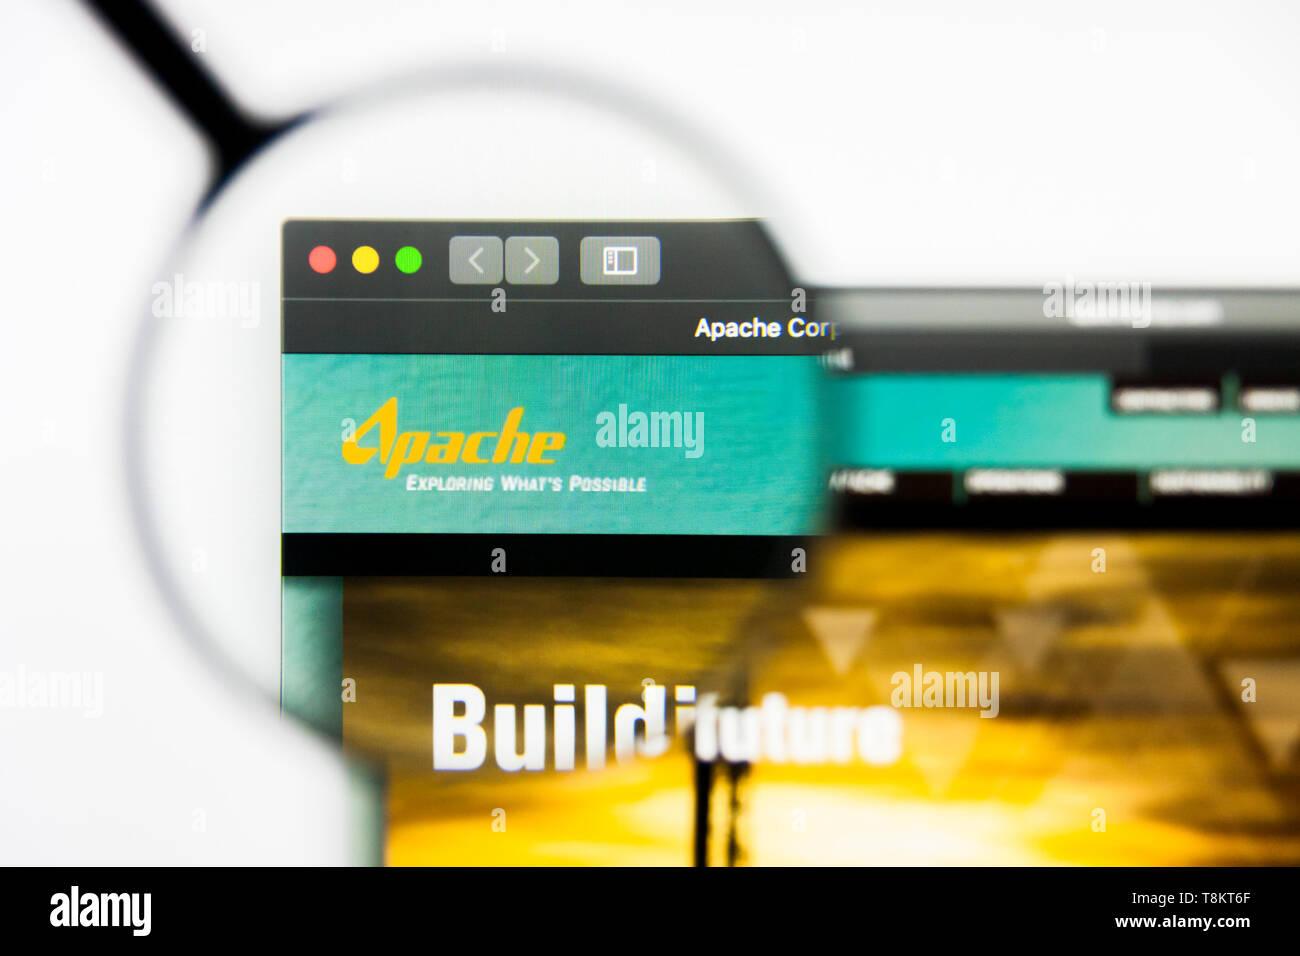 Apache Company Stock Photos & Apache Company Stock Images